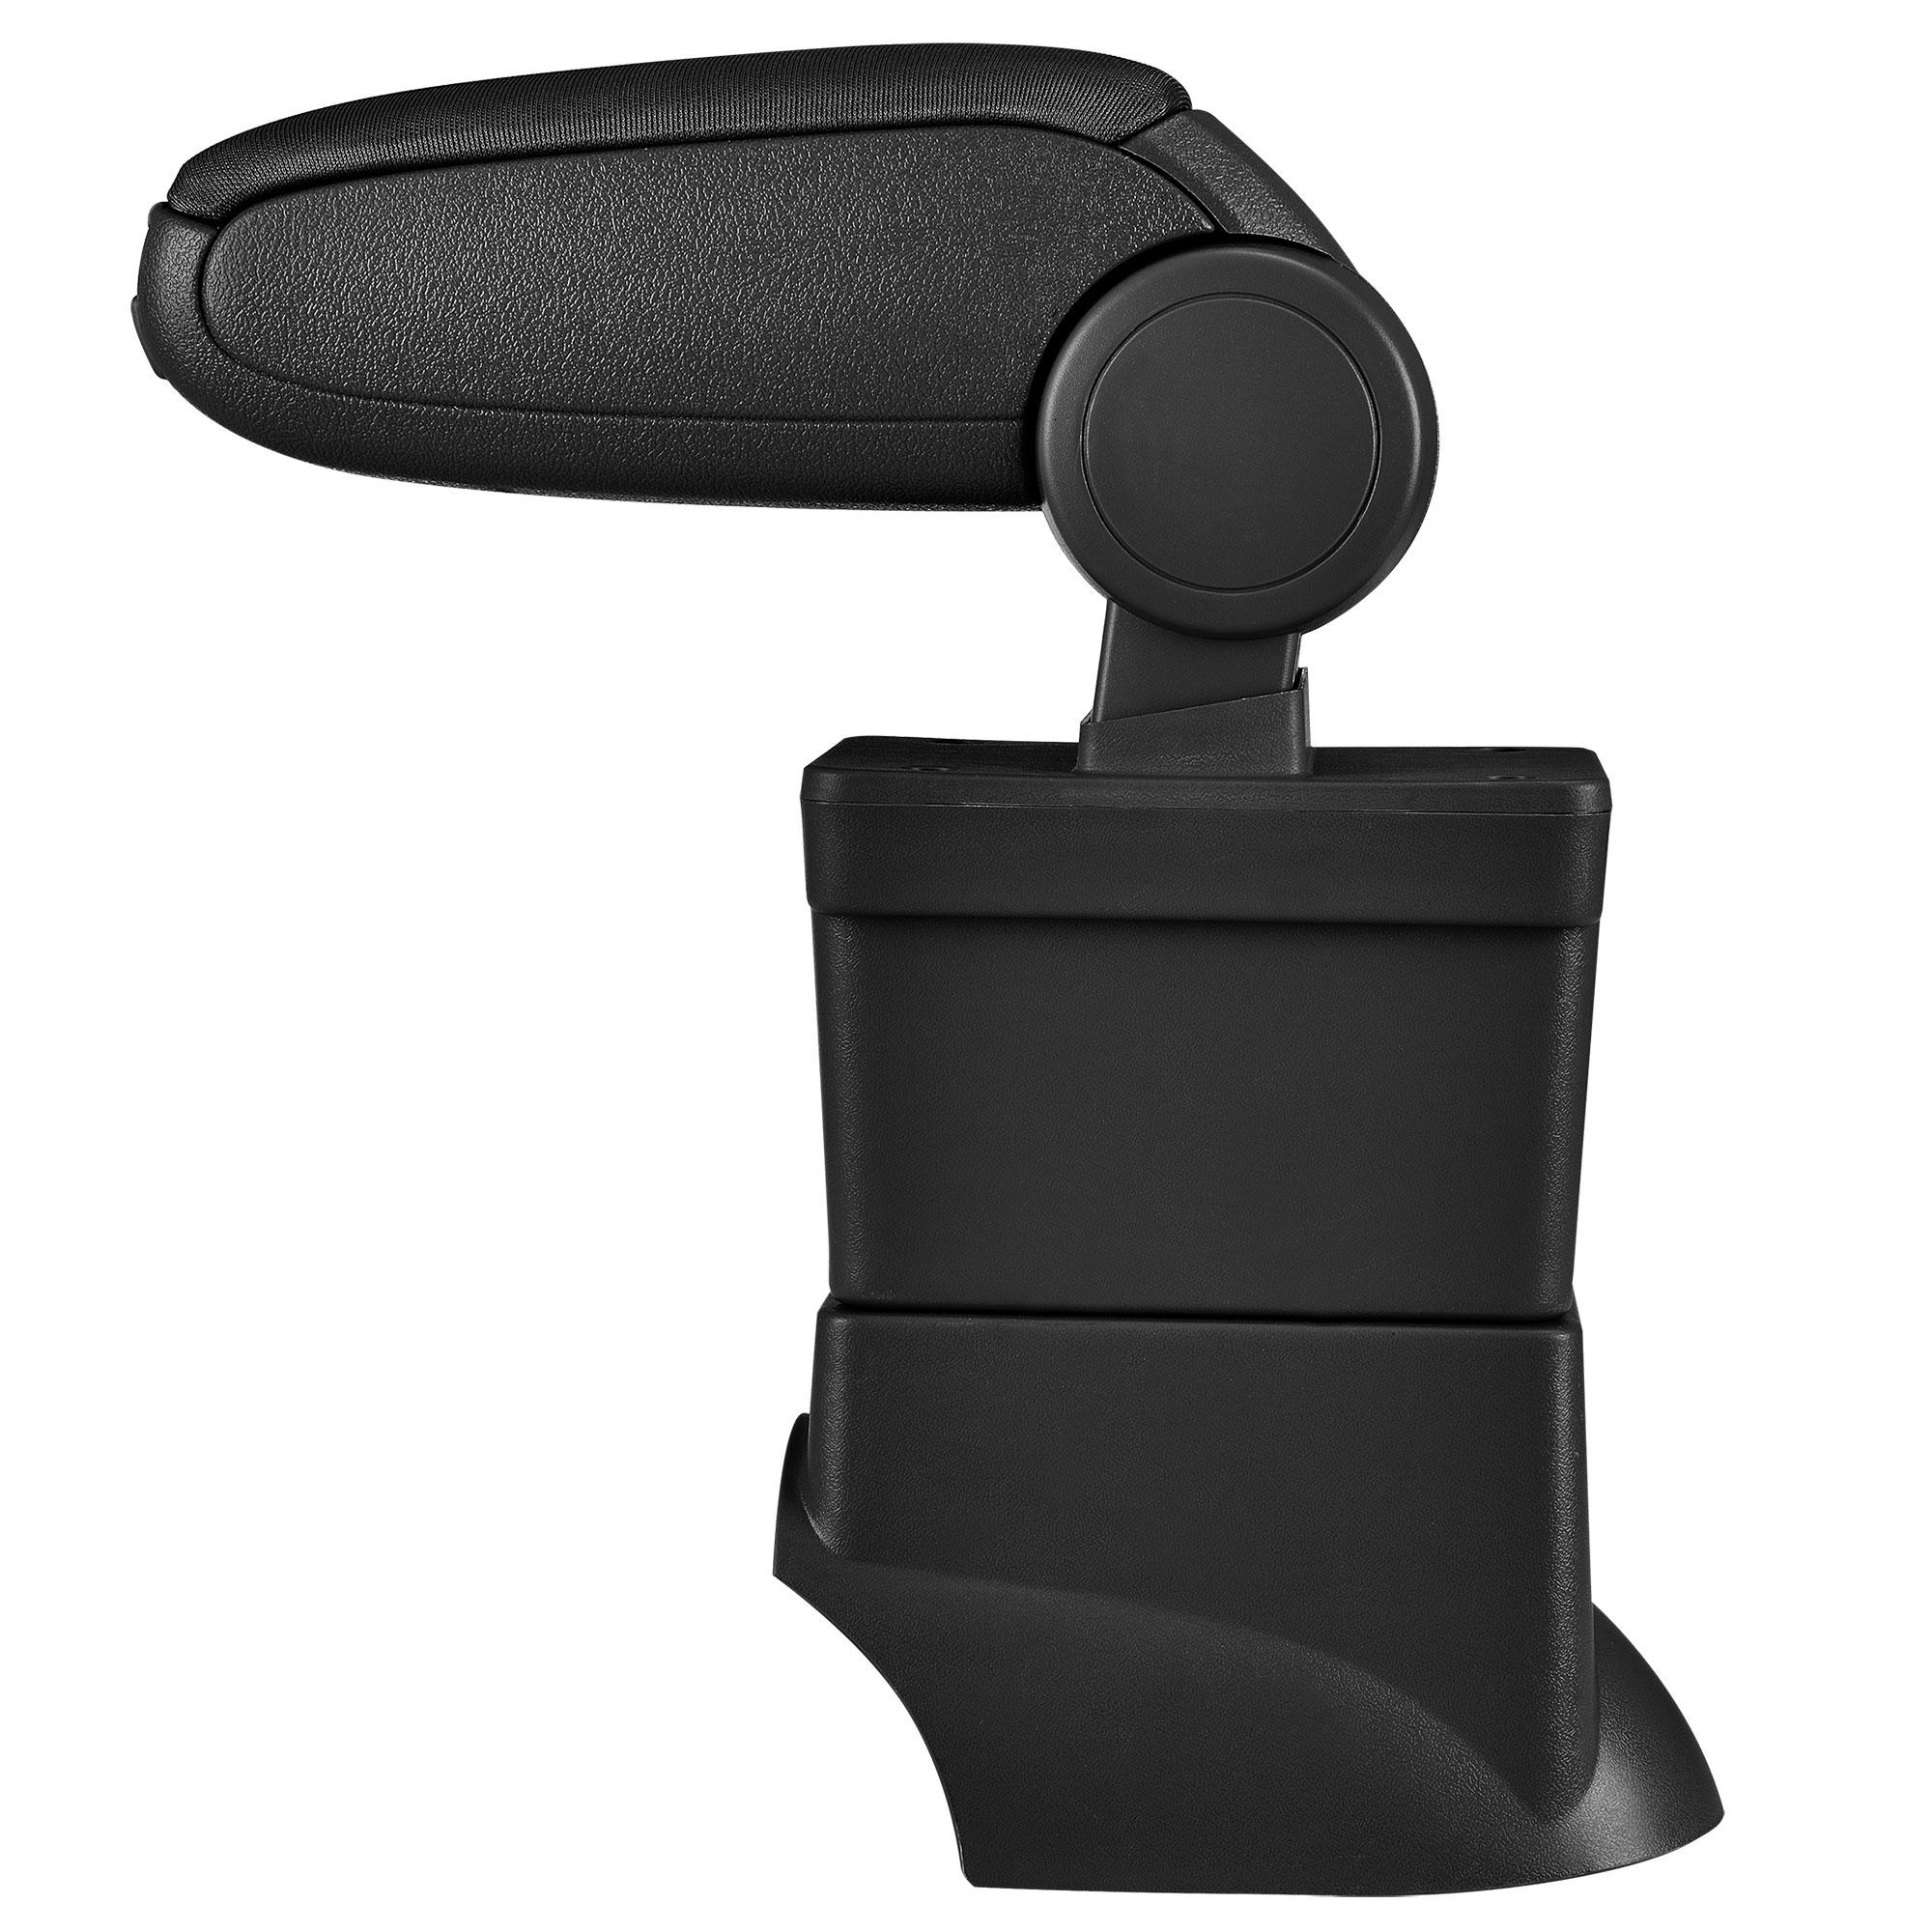 accoudoir neuf fiat 500 500c 2007 2015 tissu noir. Black Bedroom Furniture Sets. Home Design Ideas